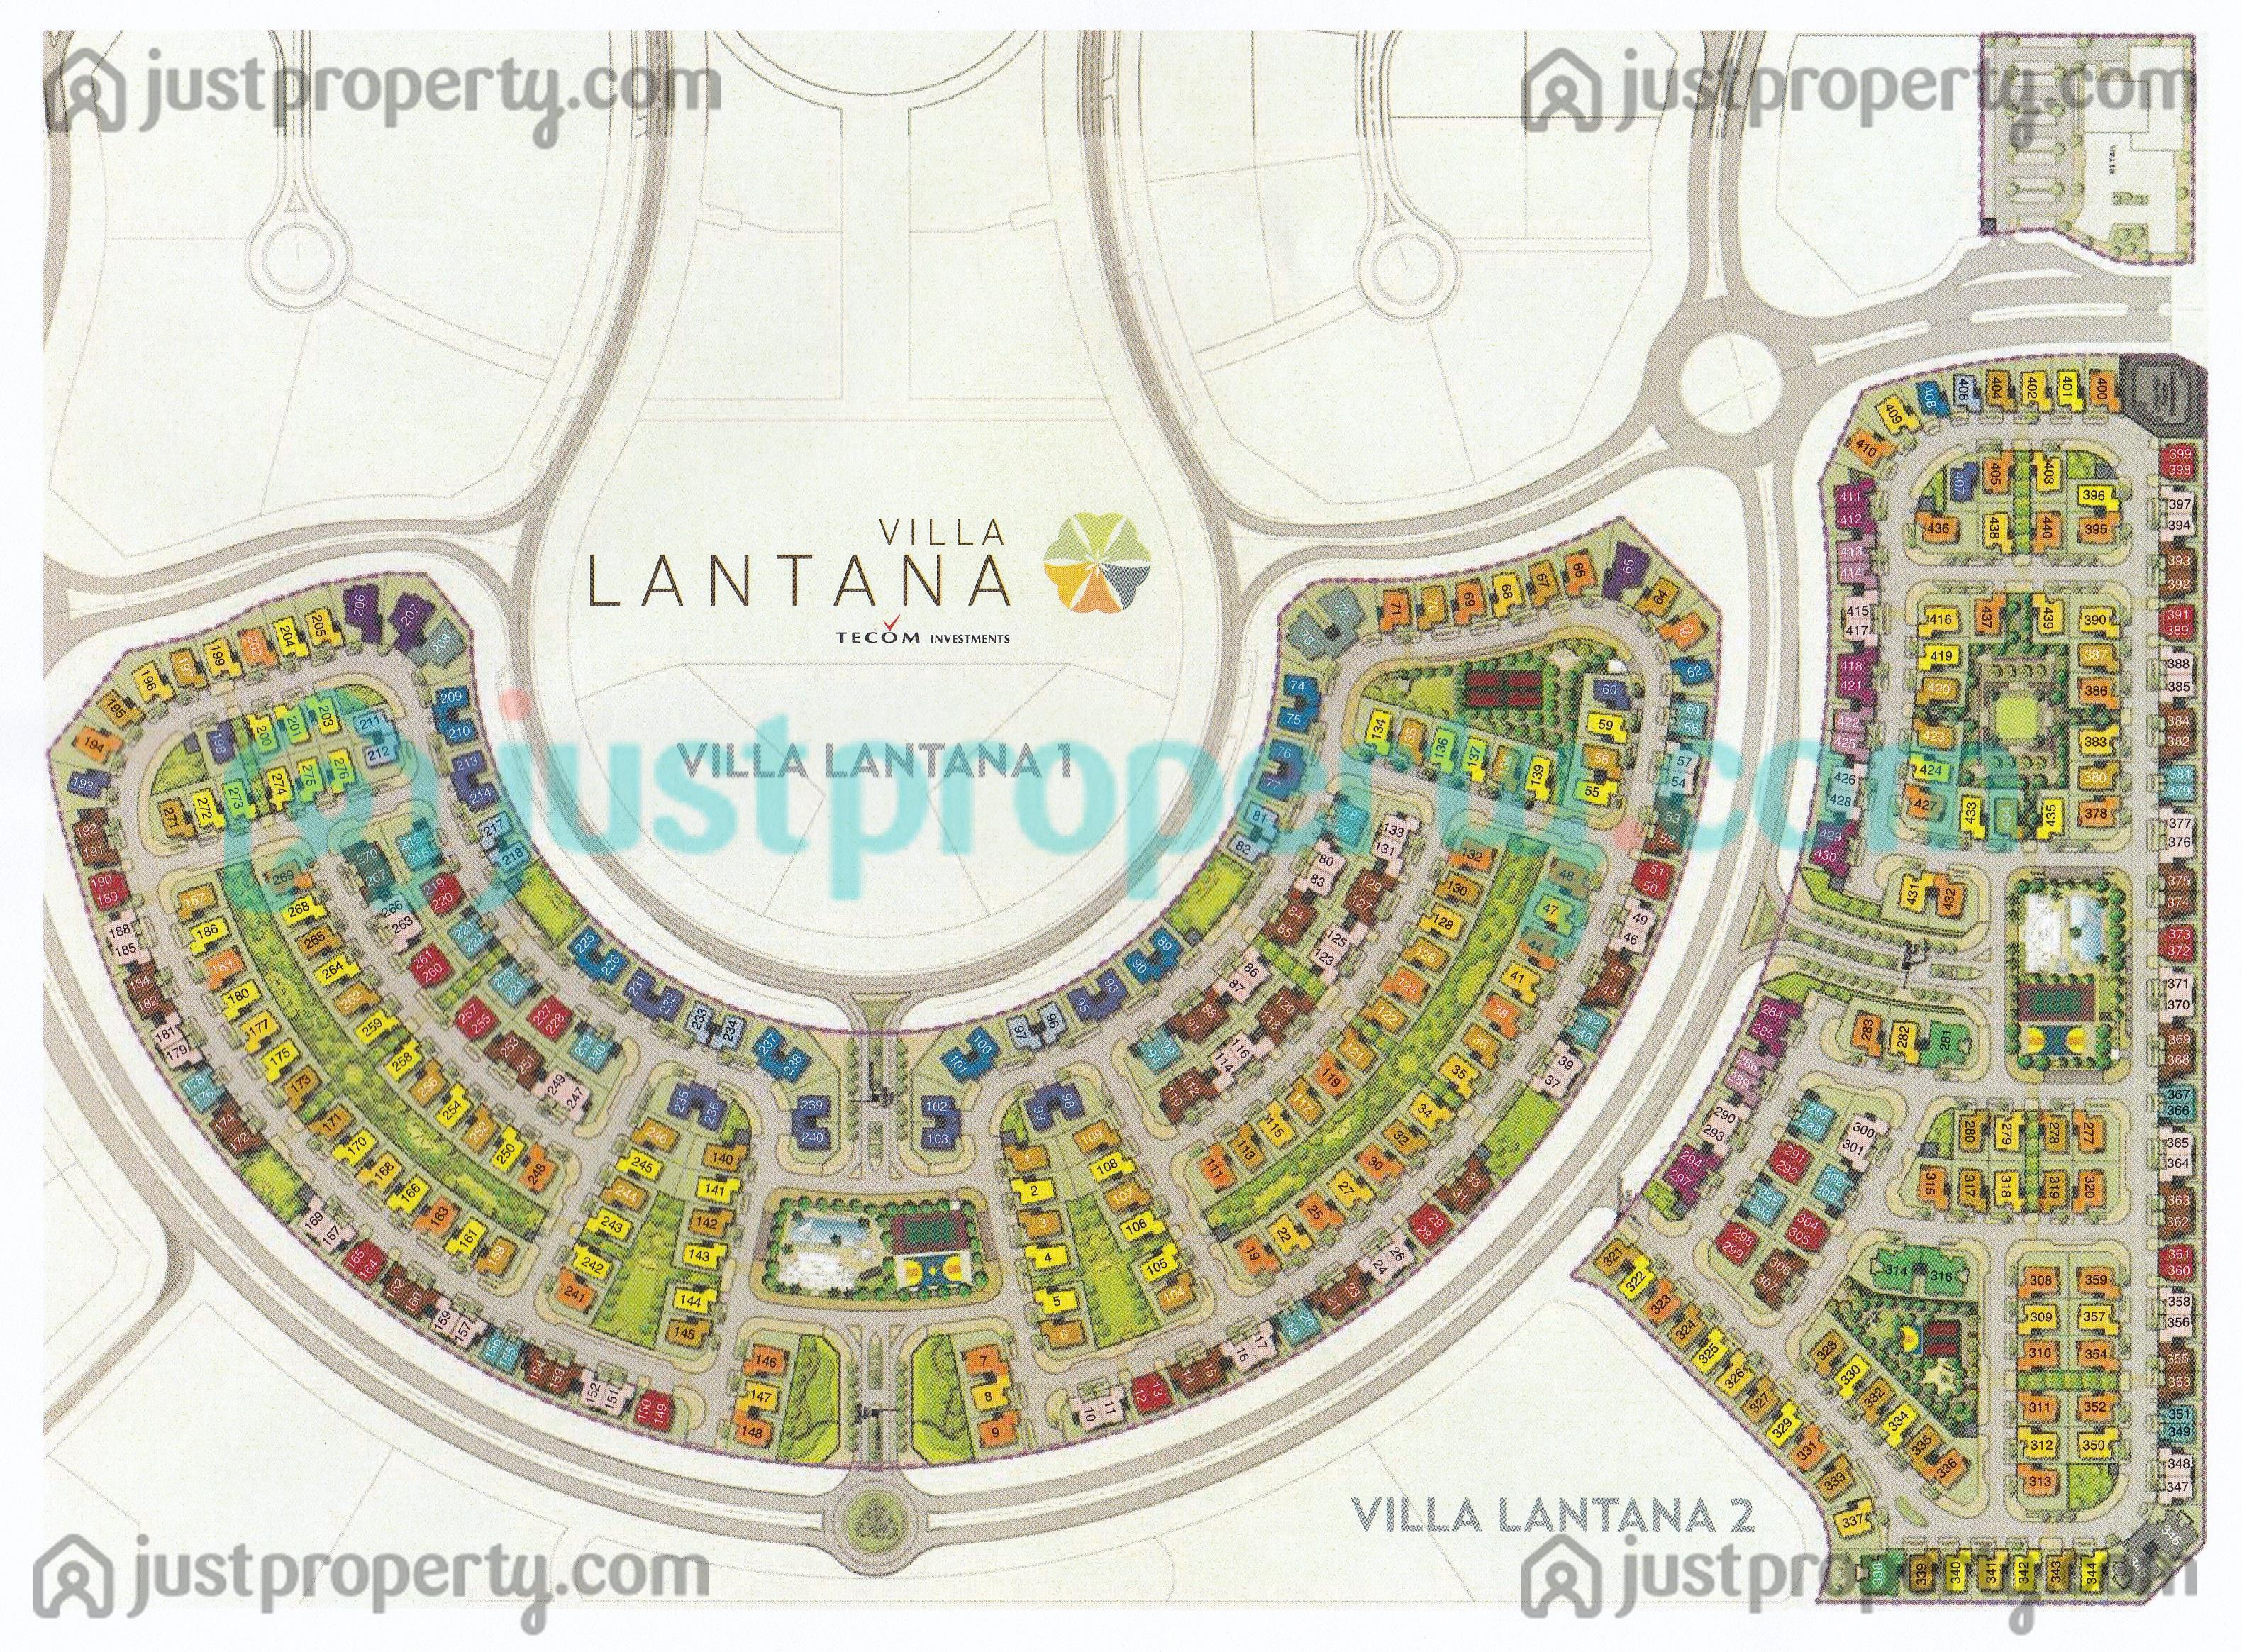 lantana villas floor plans justproperty com lantana model at sereno community davenportflorida new